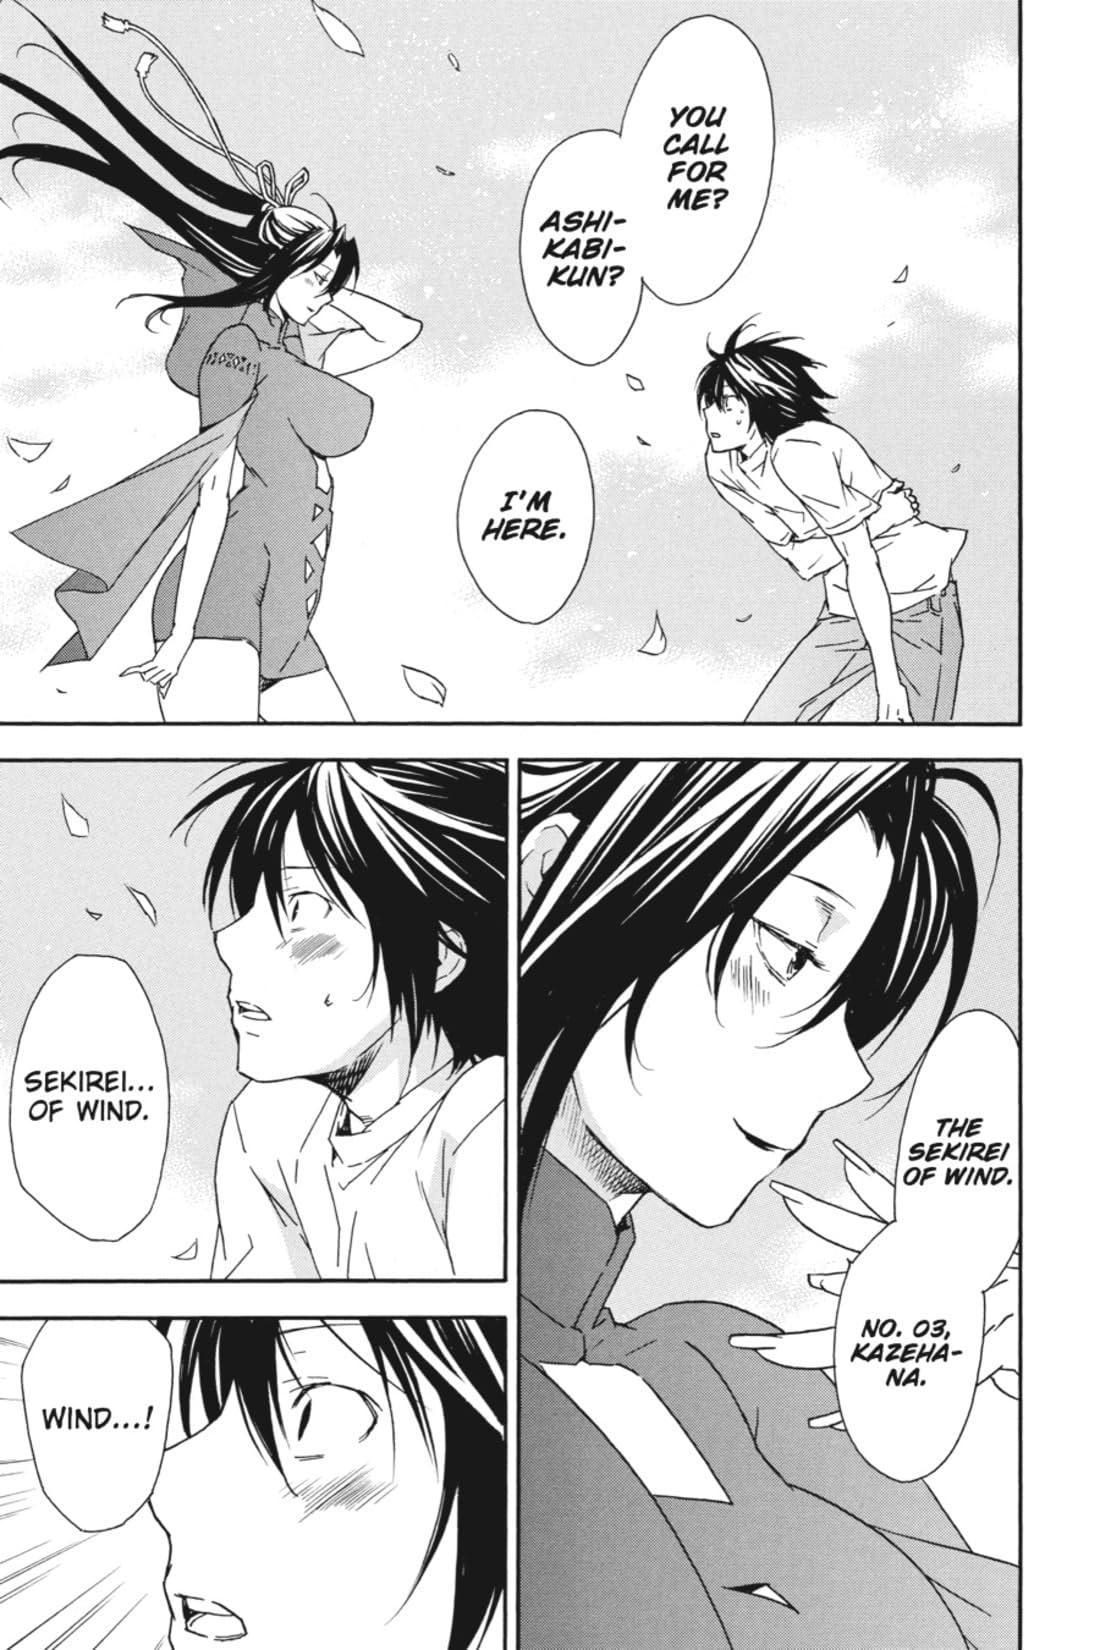 Sekirei Vol. 6